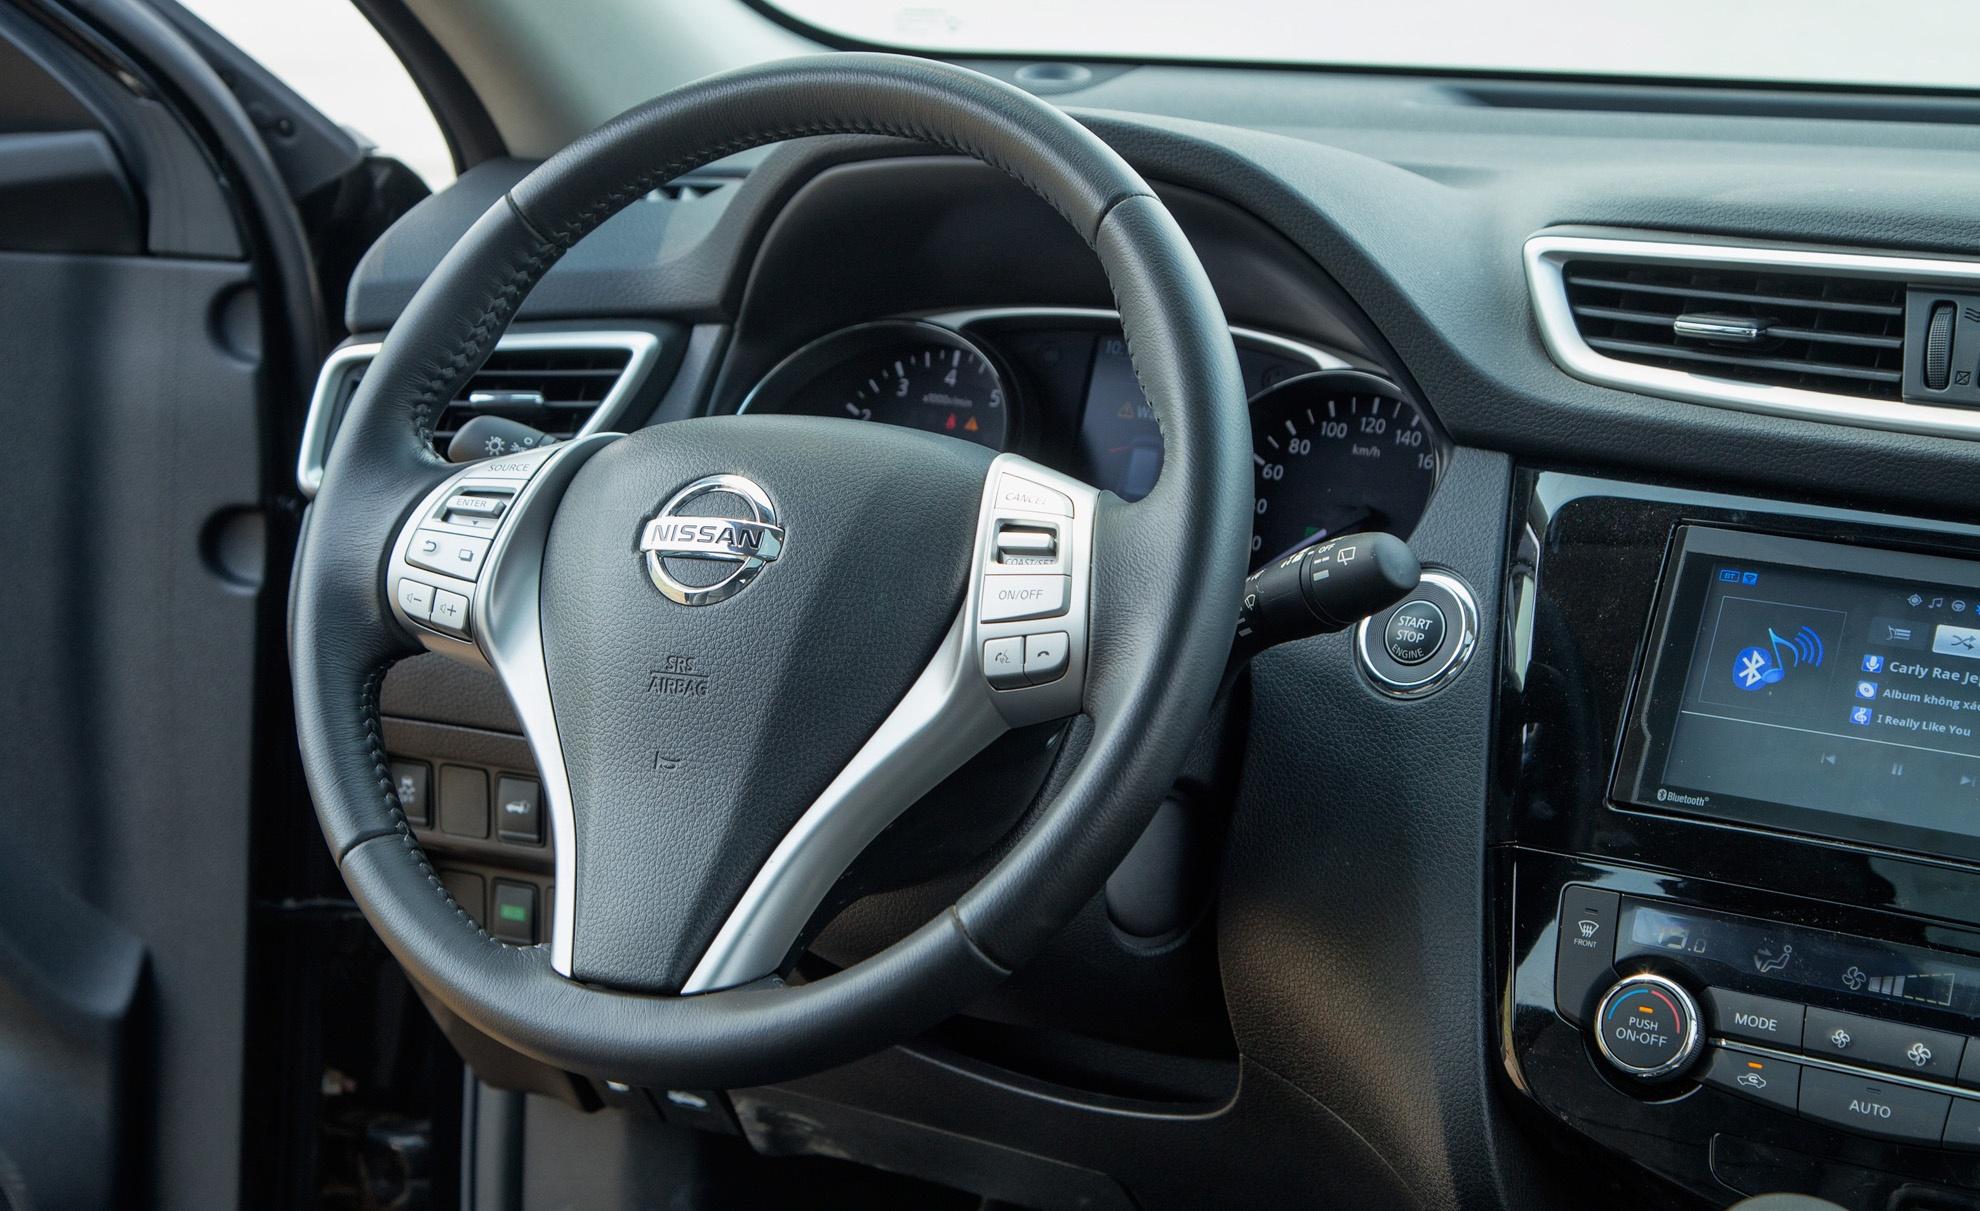 Danh gia Nissan X-Trail: Chay dua ve gia va cong nghe an toan hinh anh 4